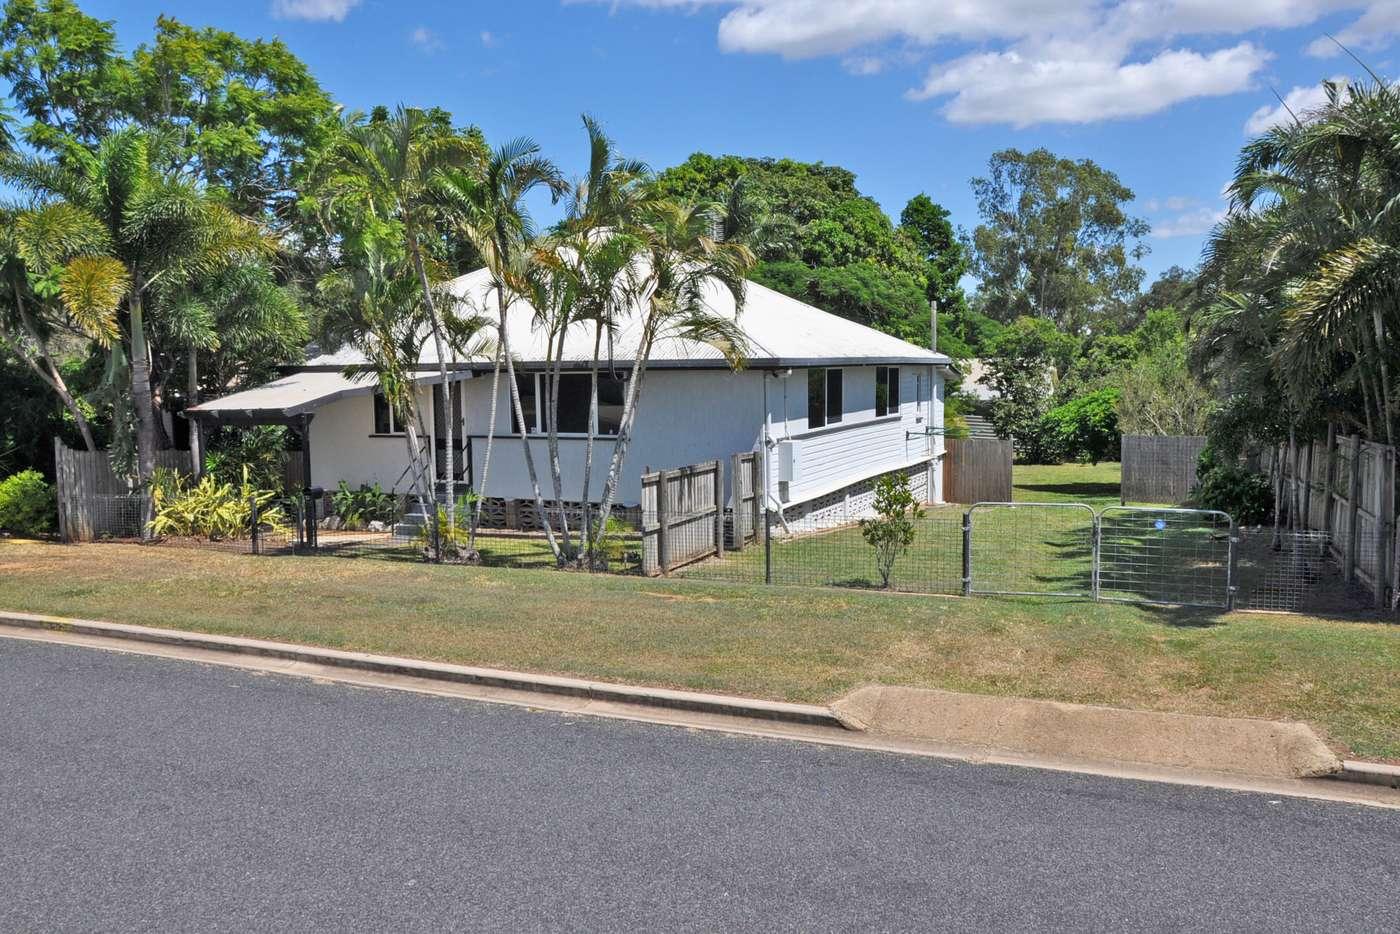 Main view of Homely house listing, 32 Strattmann Street, Mareeba QLD 4880